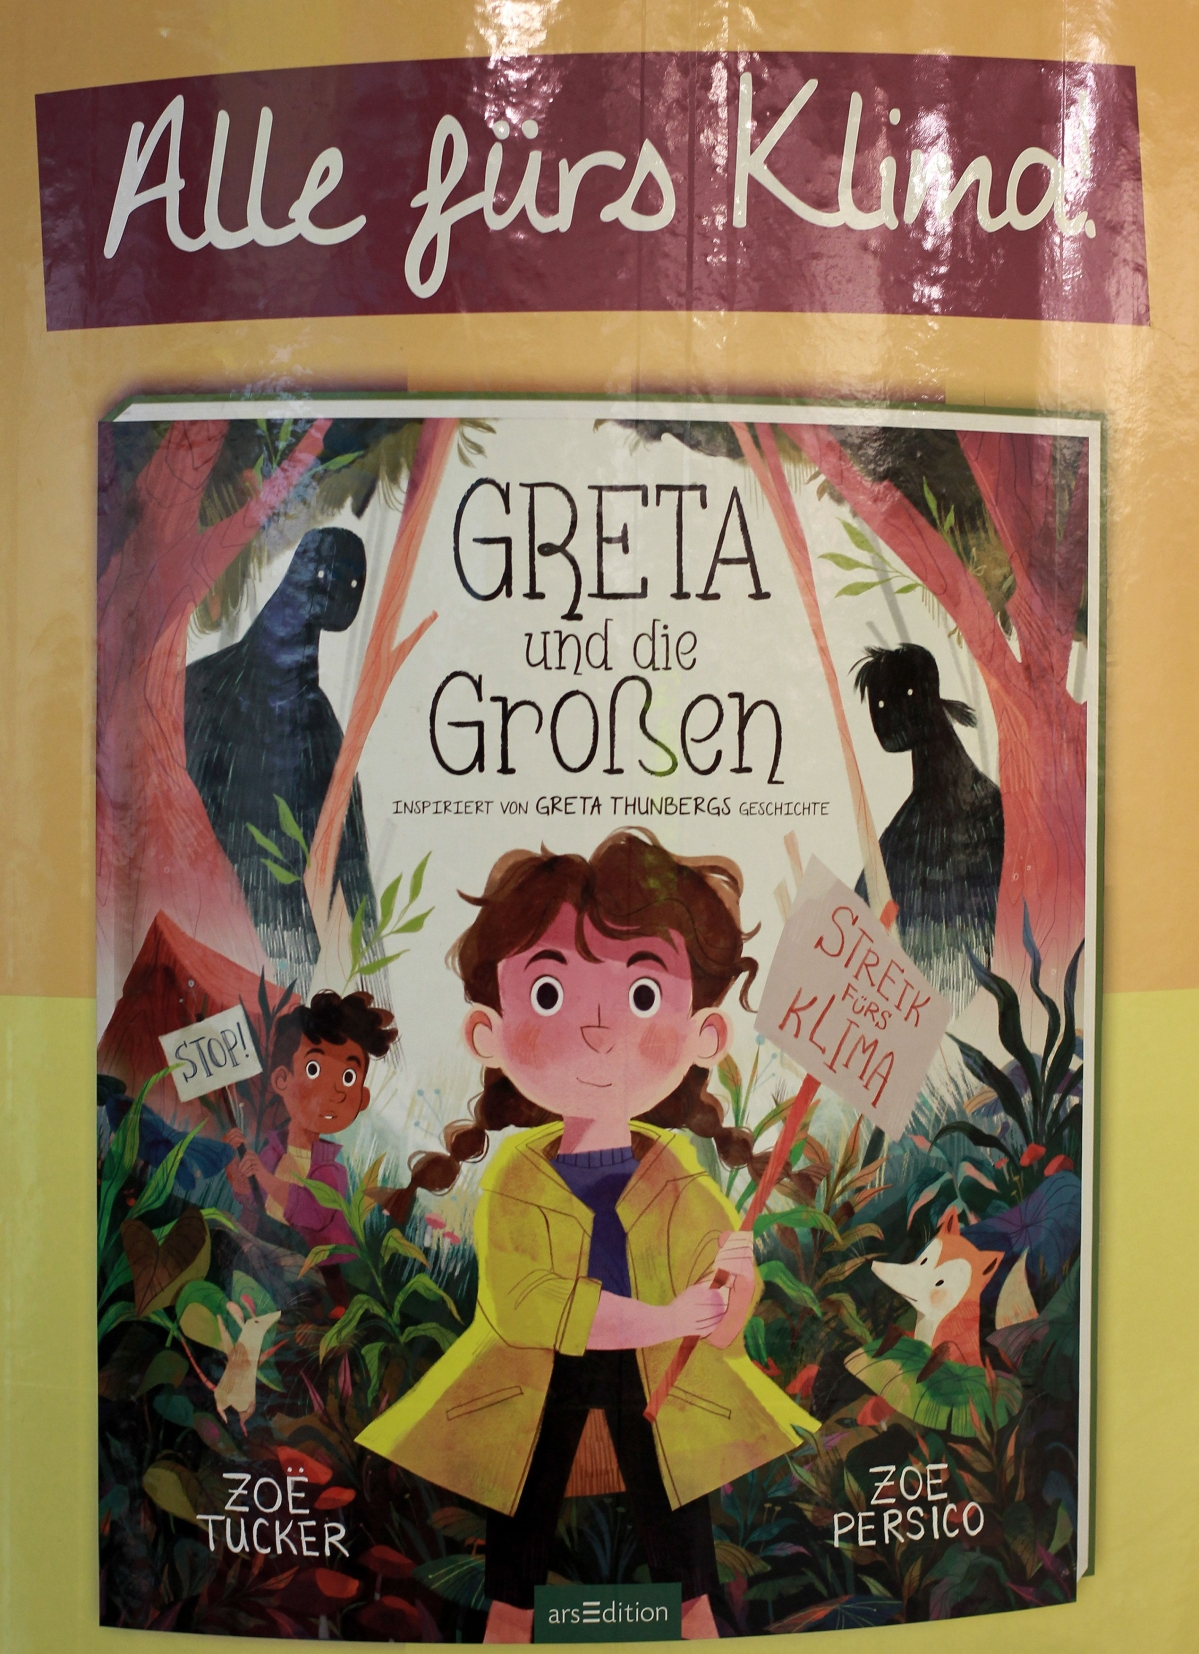 Children's book inspired by  climate activist Greta Thunberg at the Frankfurt book fair 2019.